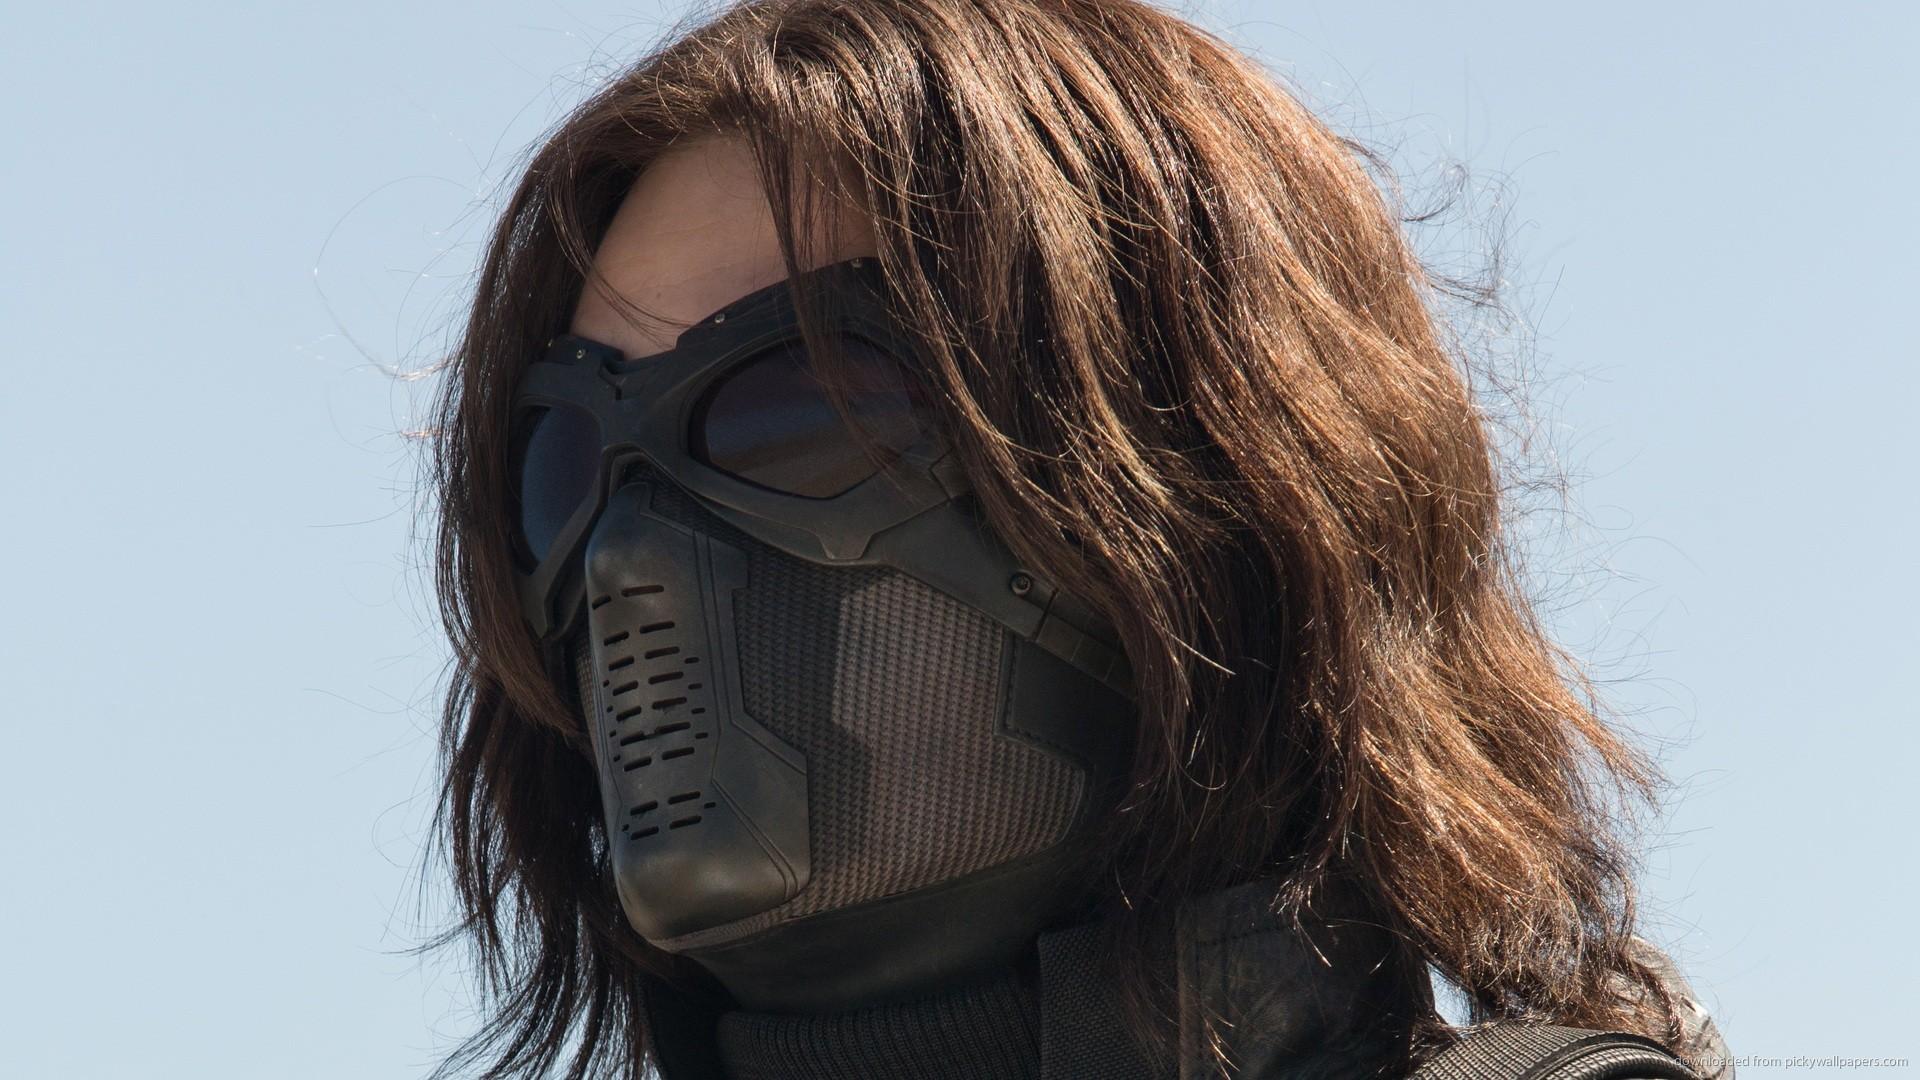 Winter Soldier Full Uniform picture